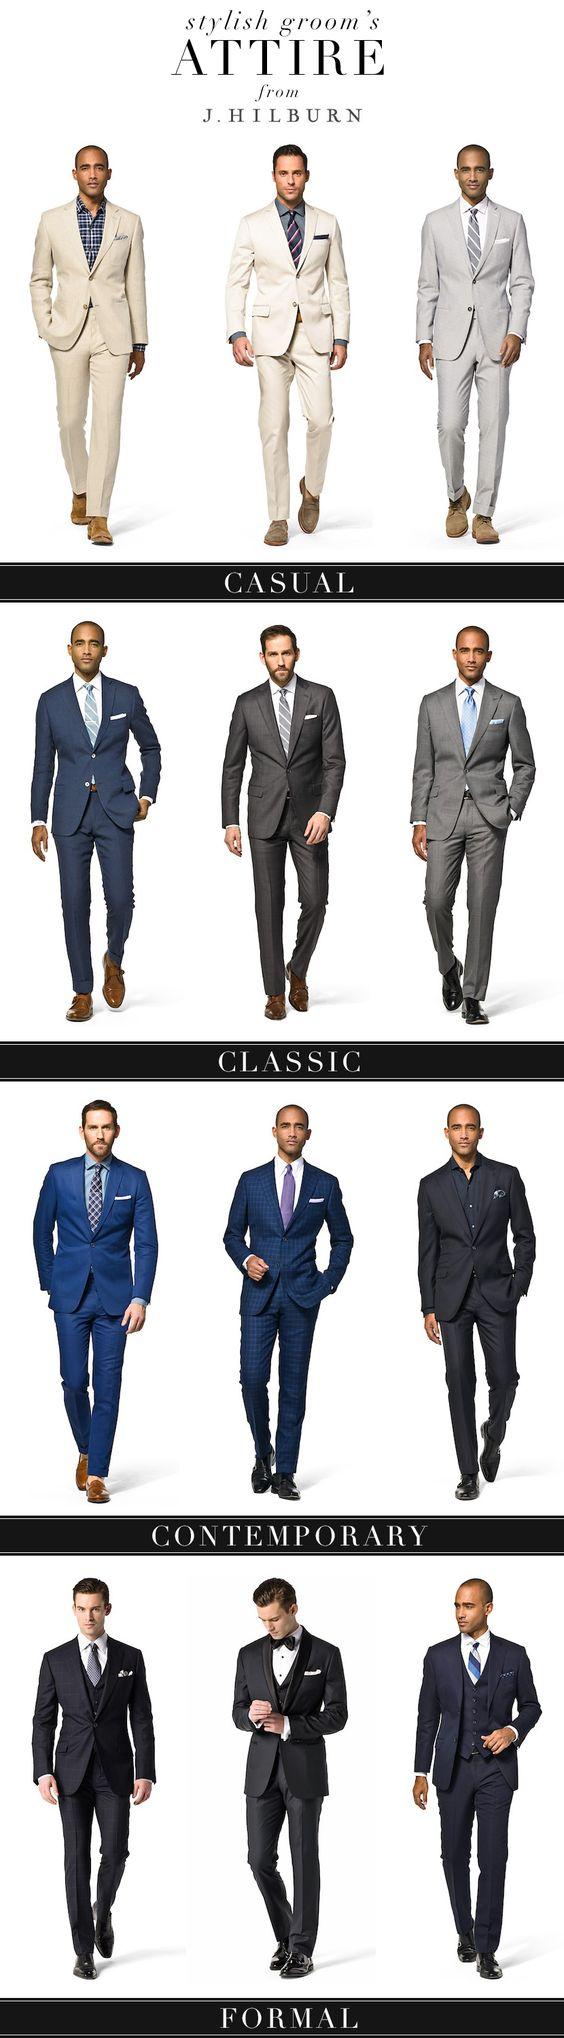 stili abbigliamento maschile